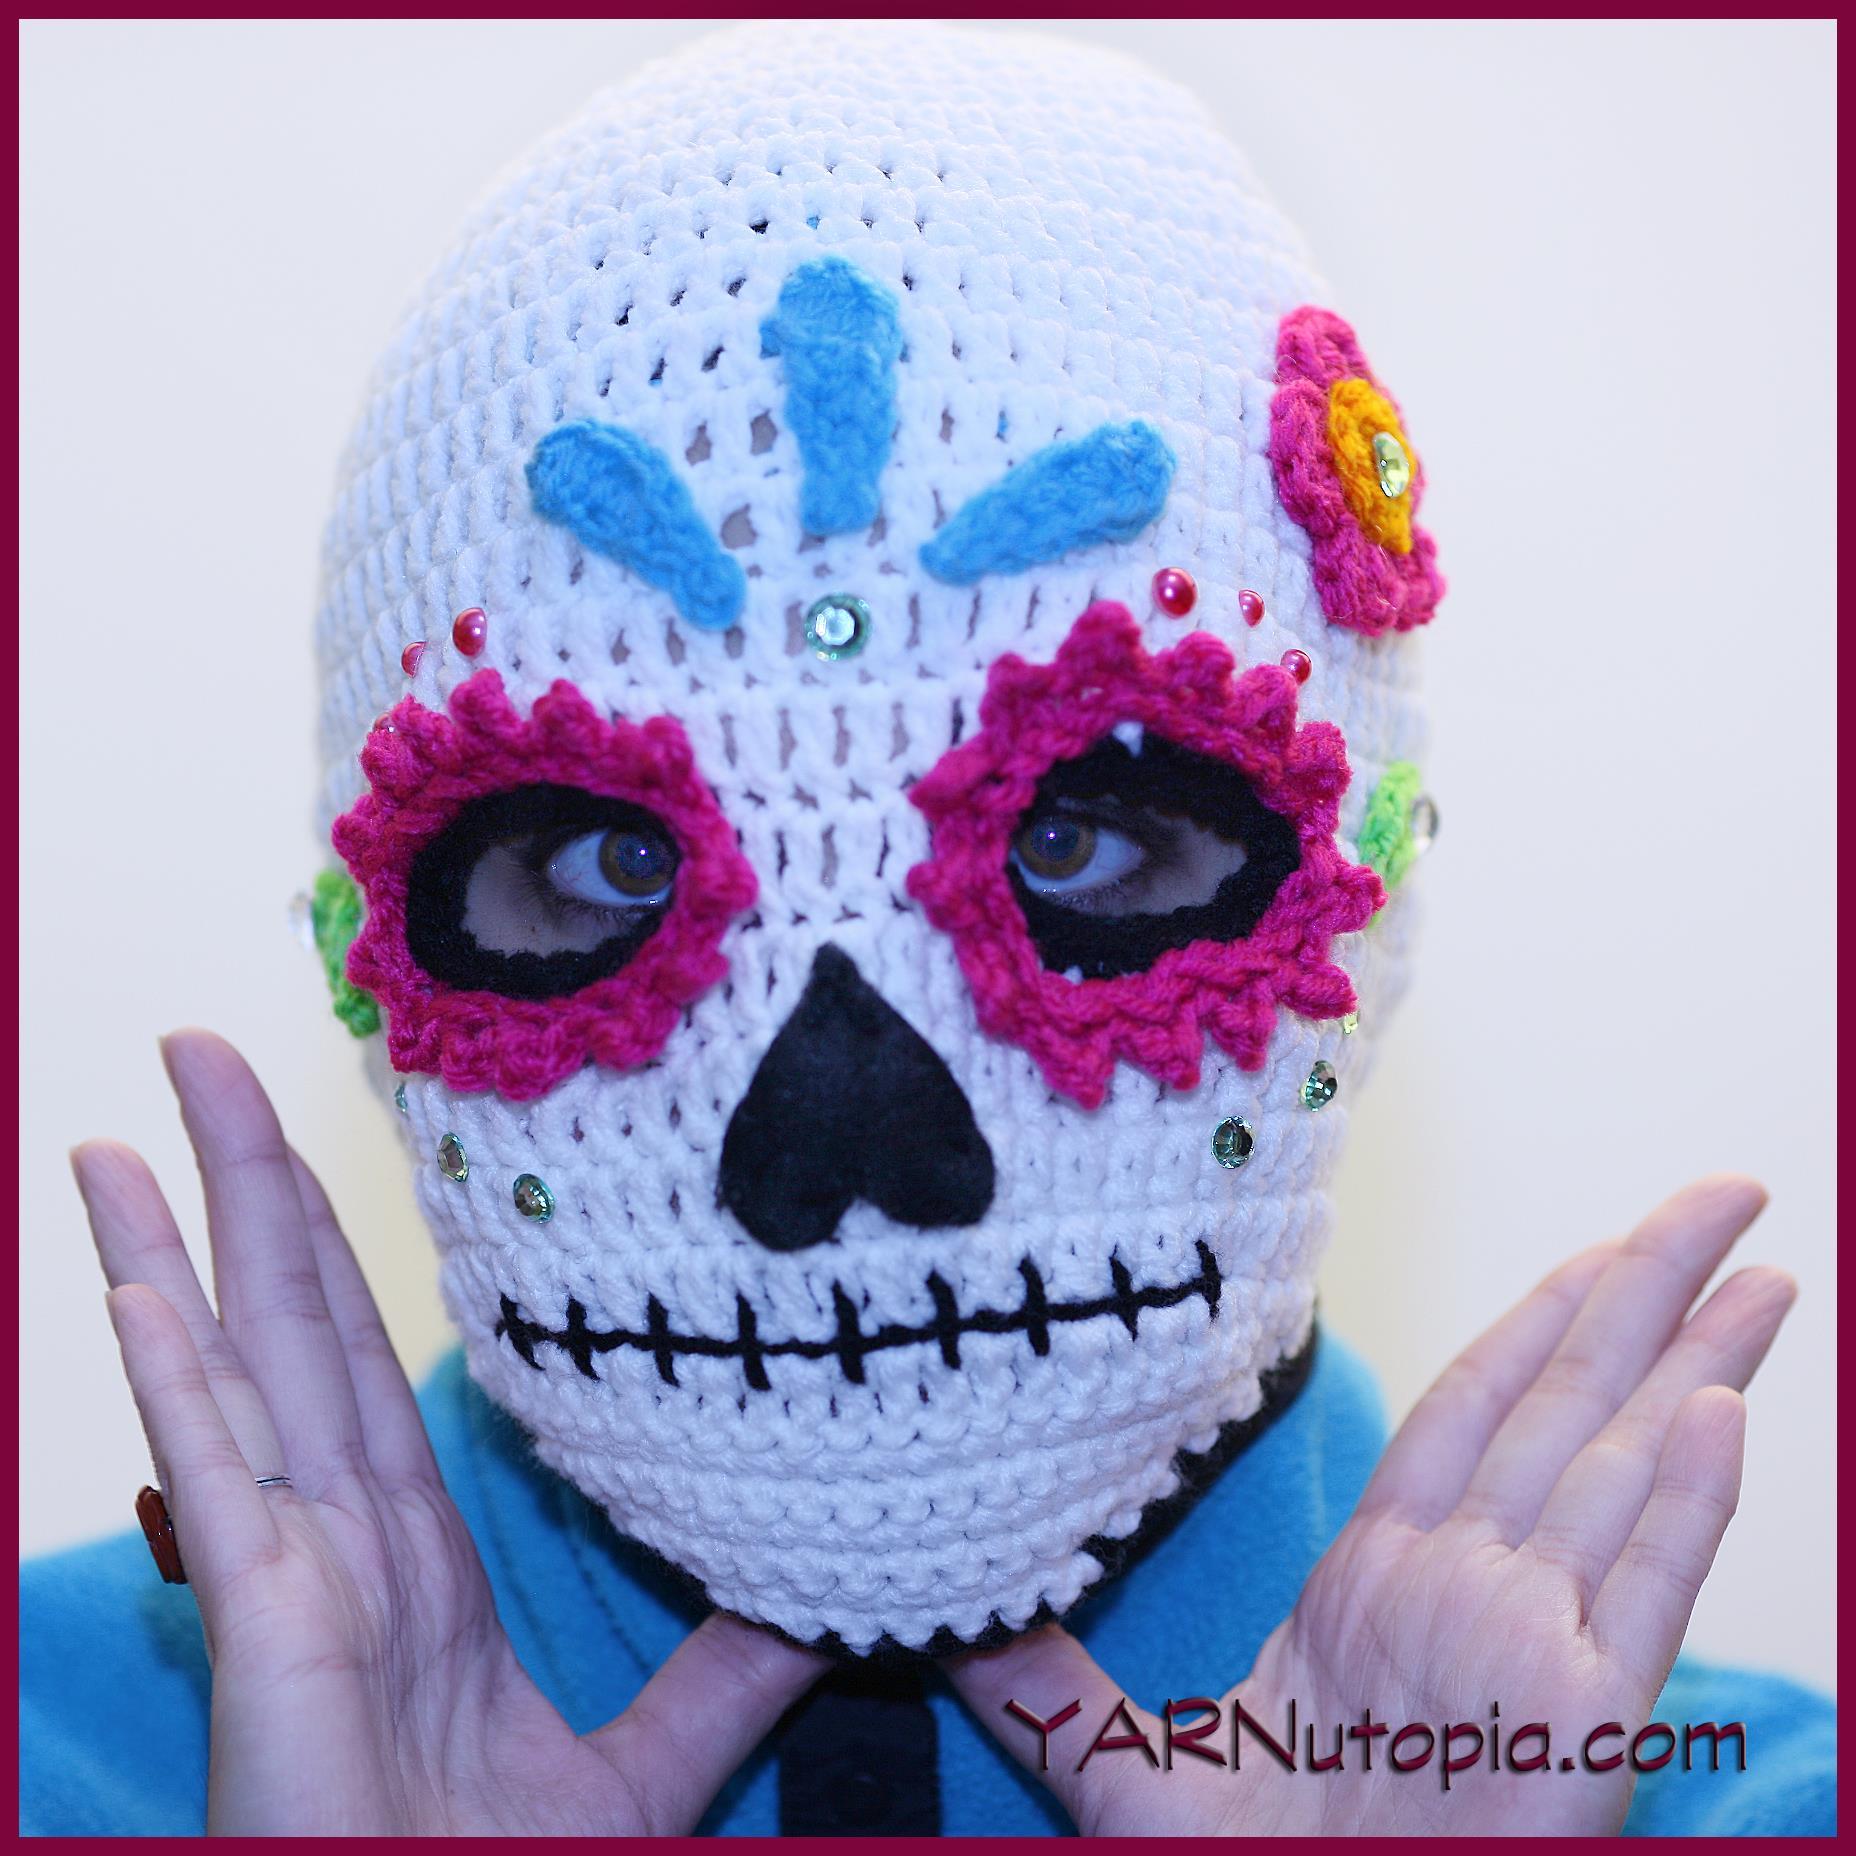 Skull Snowflake Crochet Free Patterns - Crochet & Knitting | 1856x1856